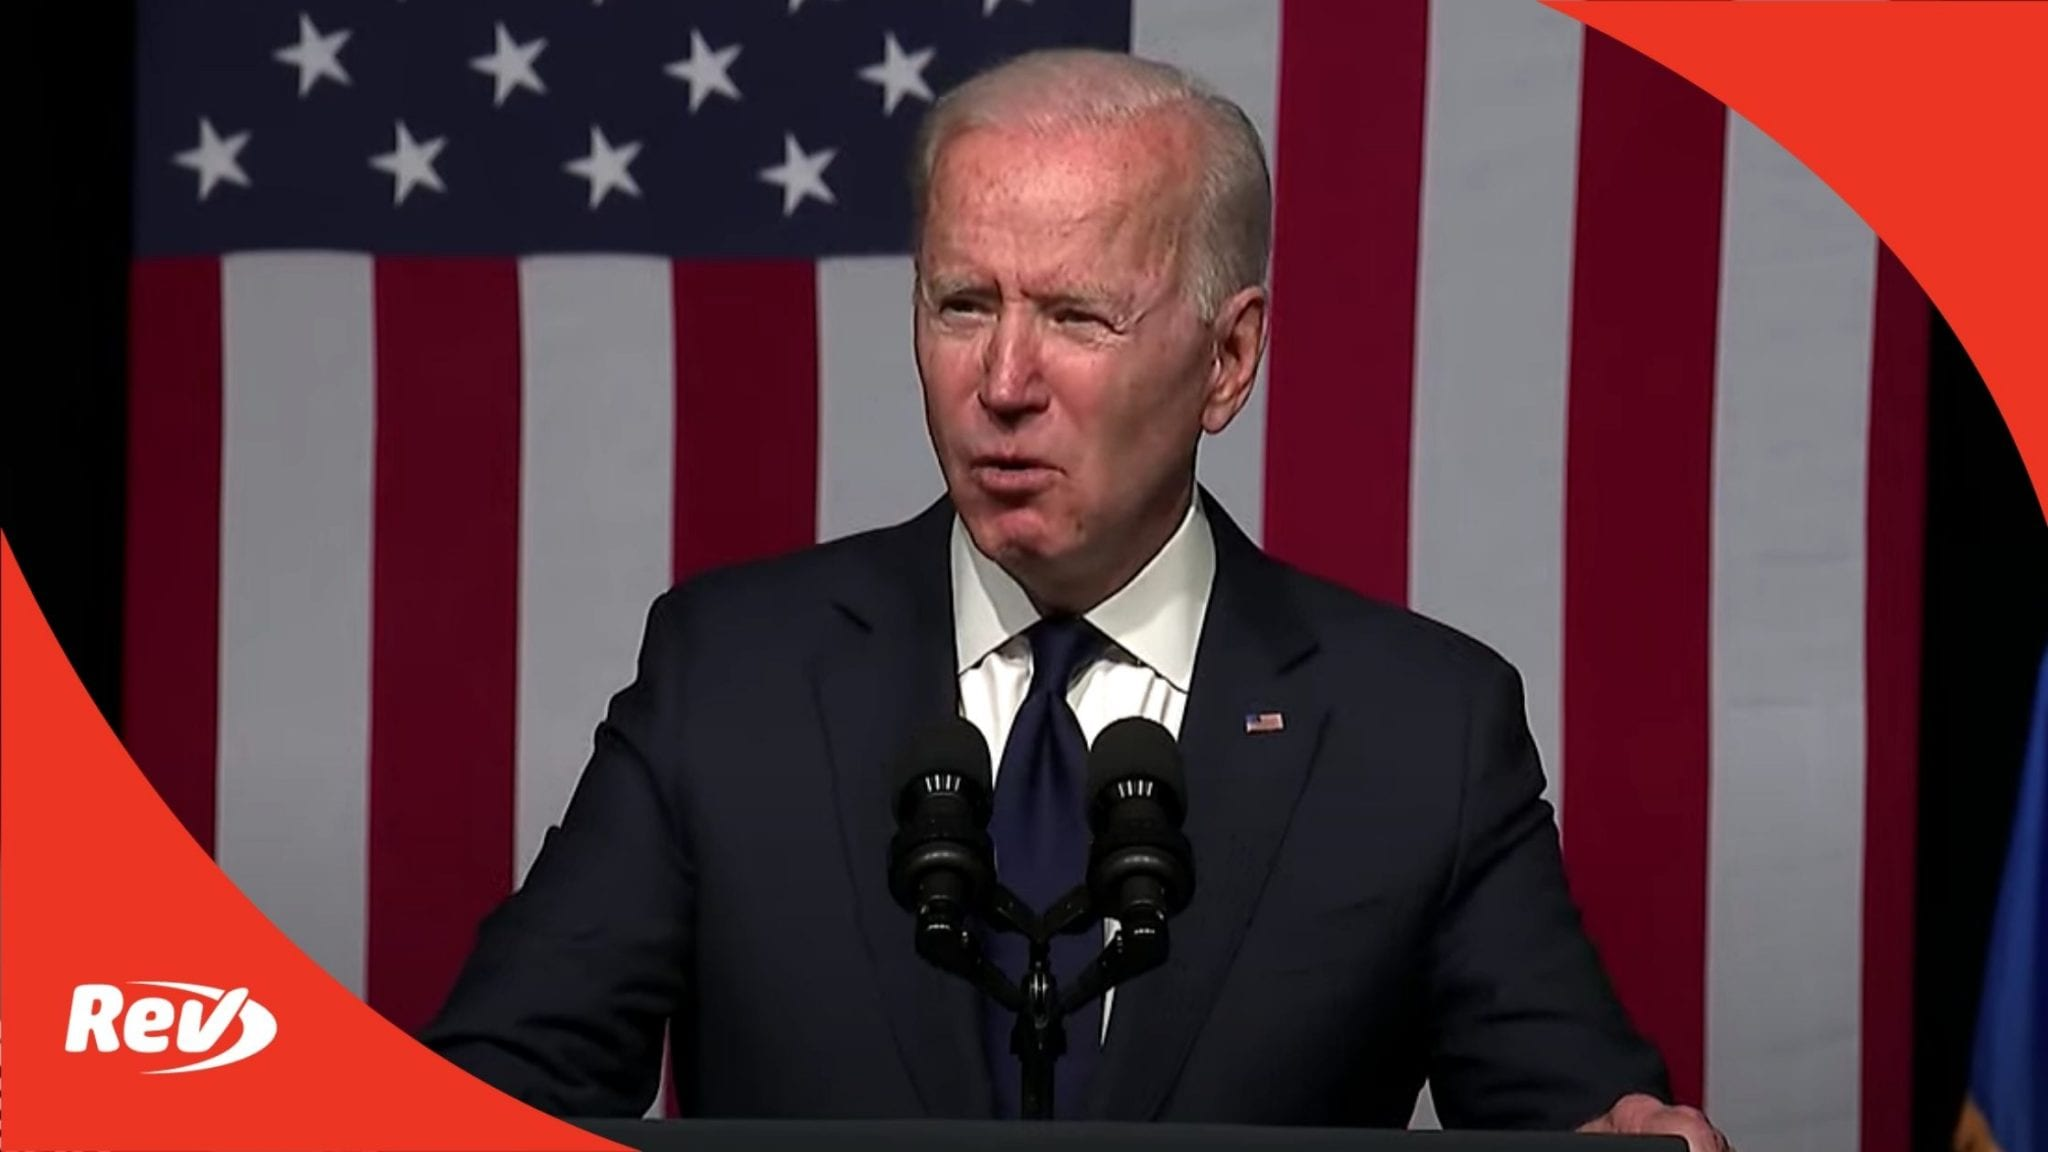 Joe Biden Tulsa Race Massacre Anniversary Speech Transcript